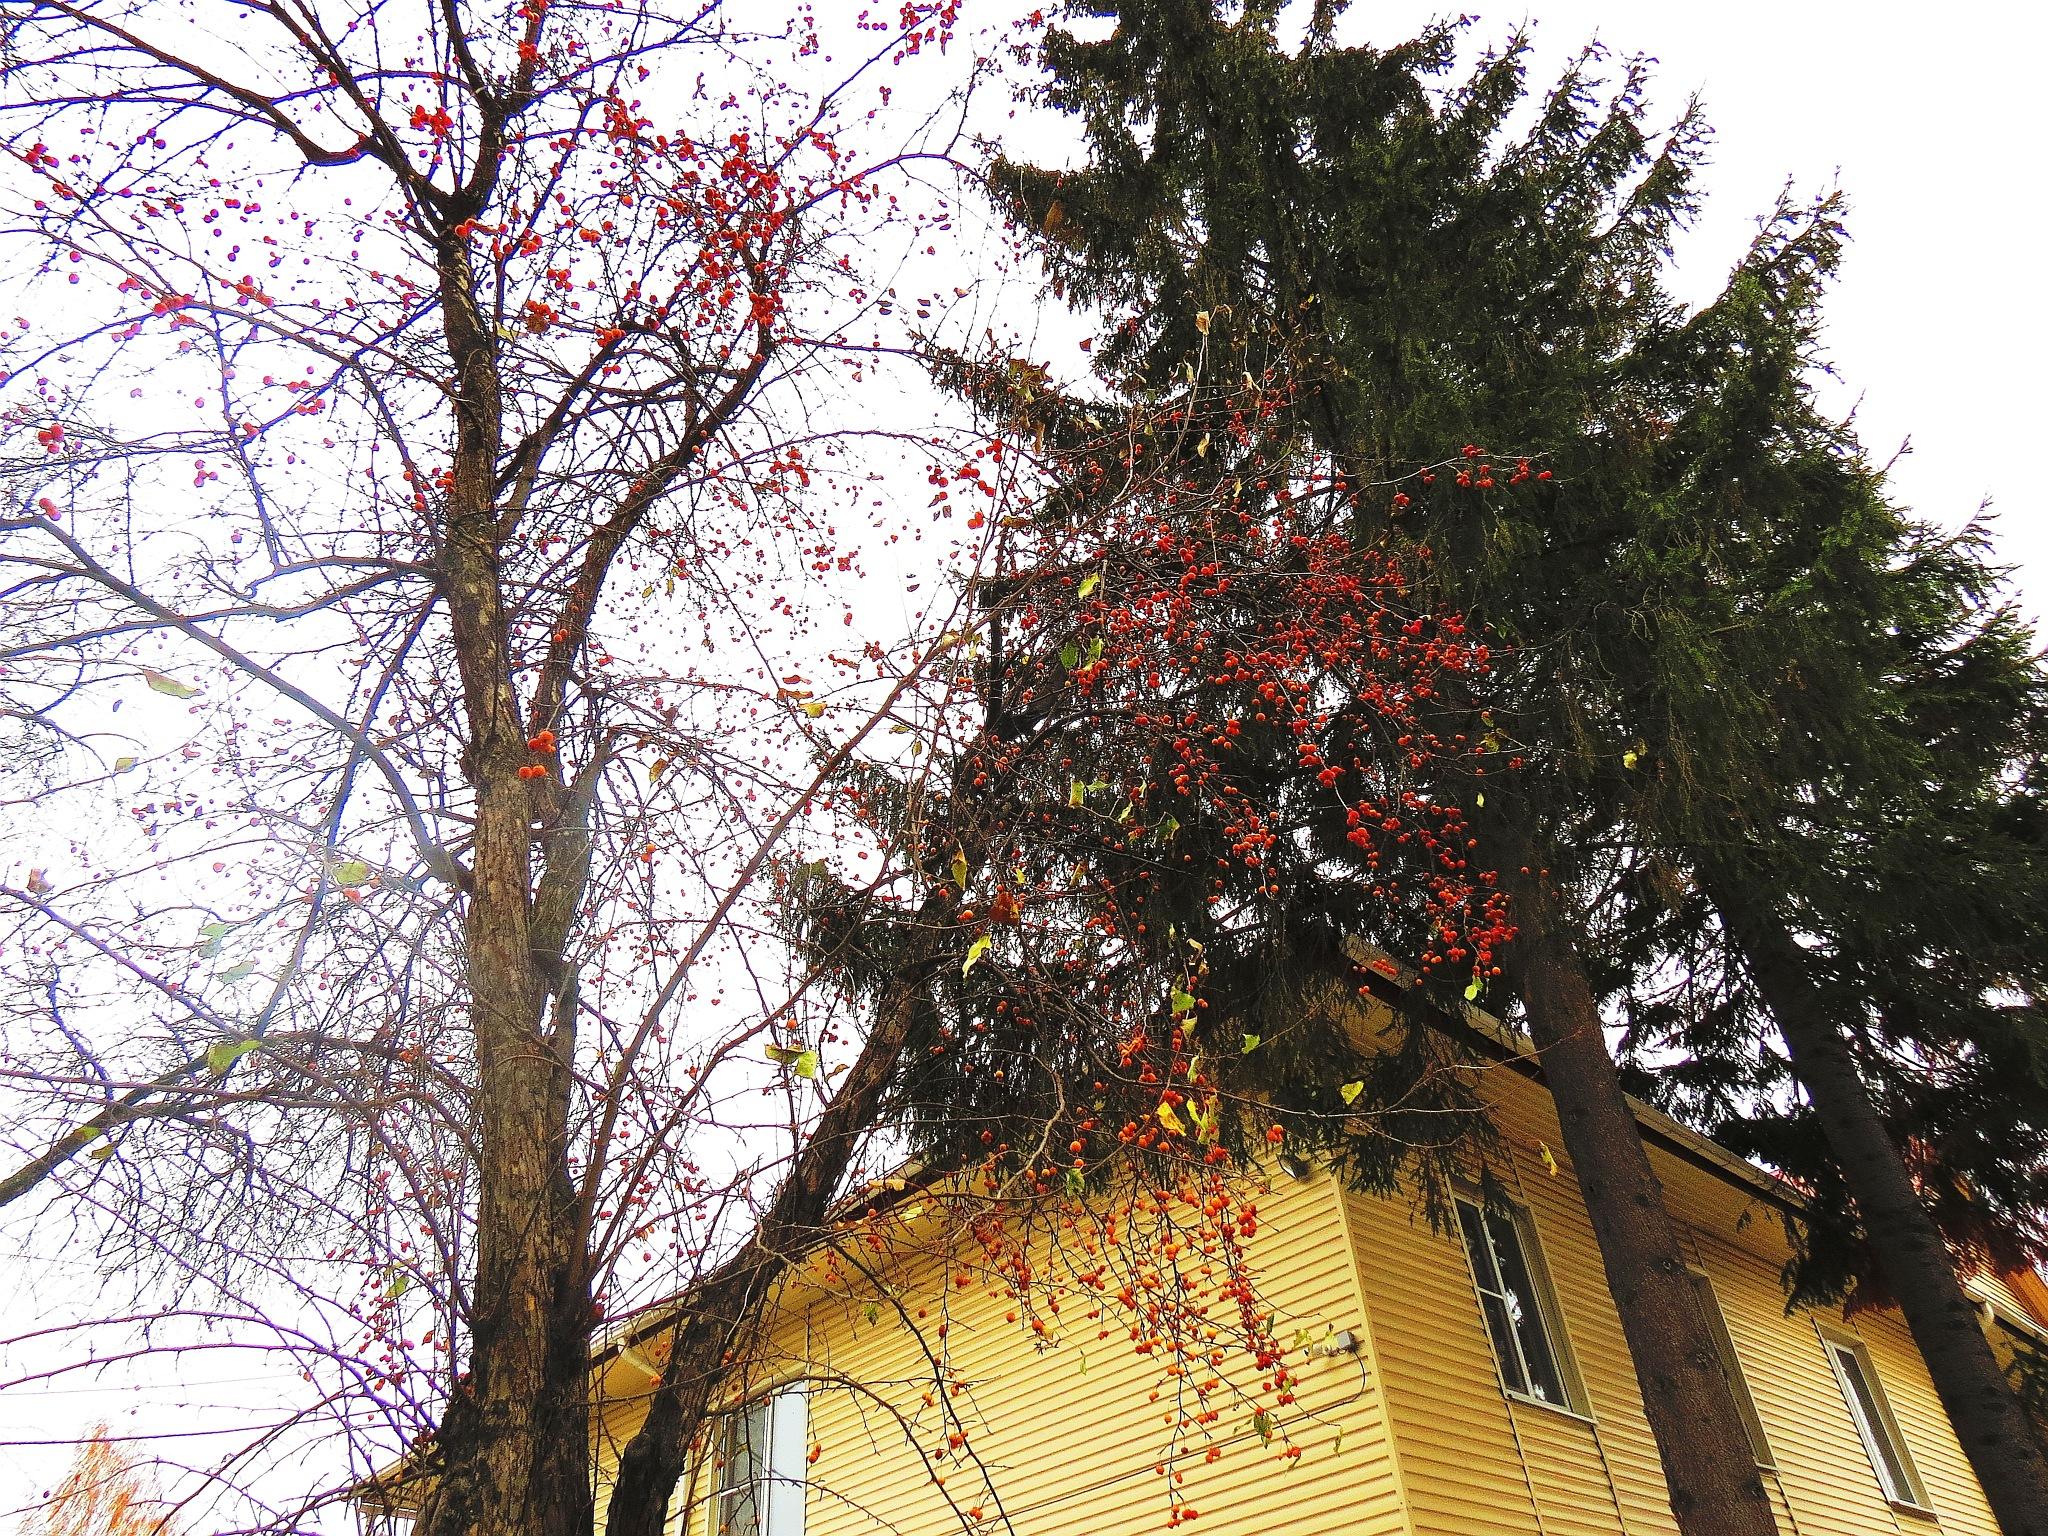 Magic apple-tree of fall by sergey.parfeniuk